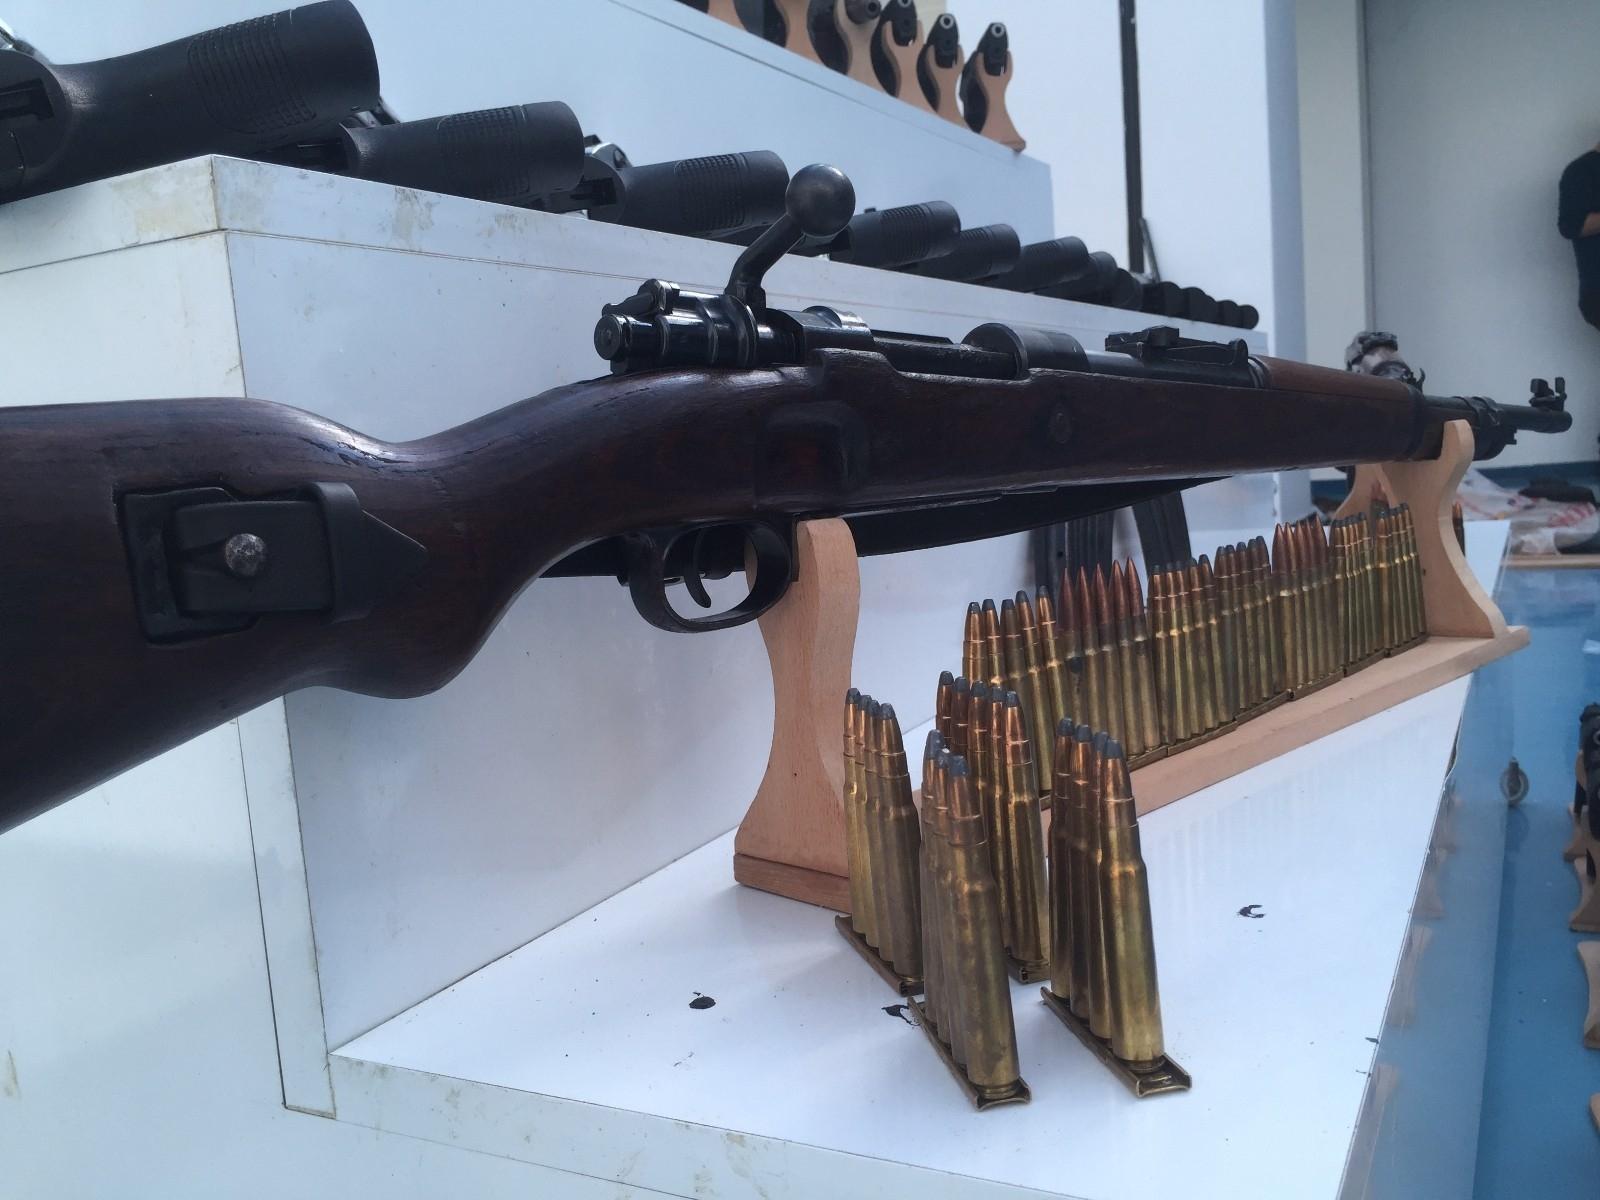 2021/04/silah-kacakciligi-operasyonu-20210427AW30-1.jpg